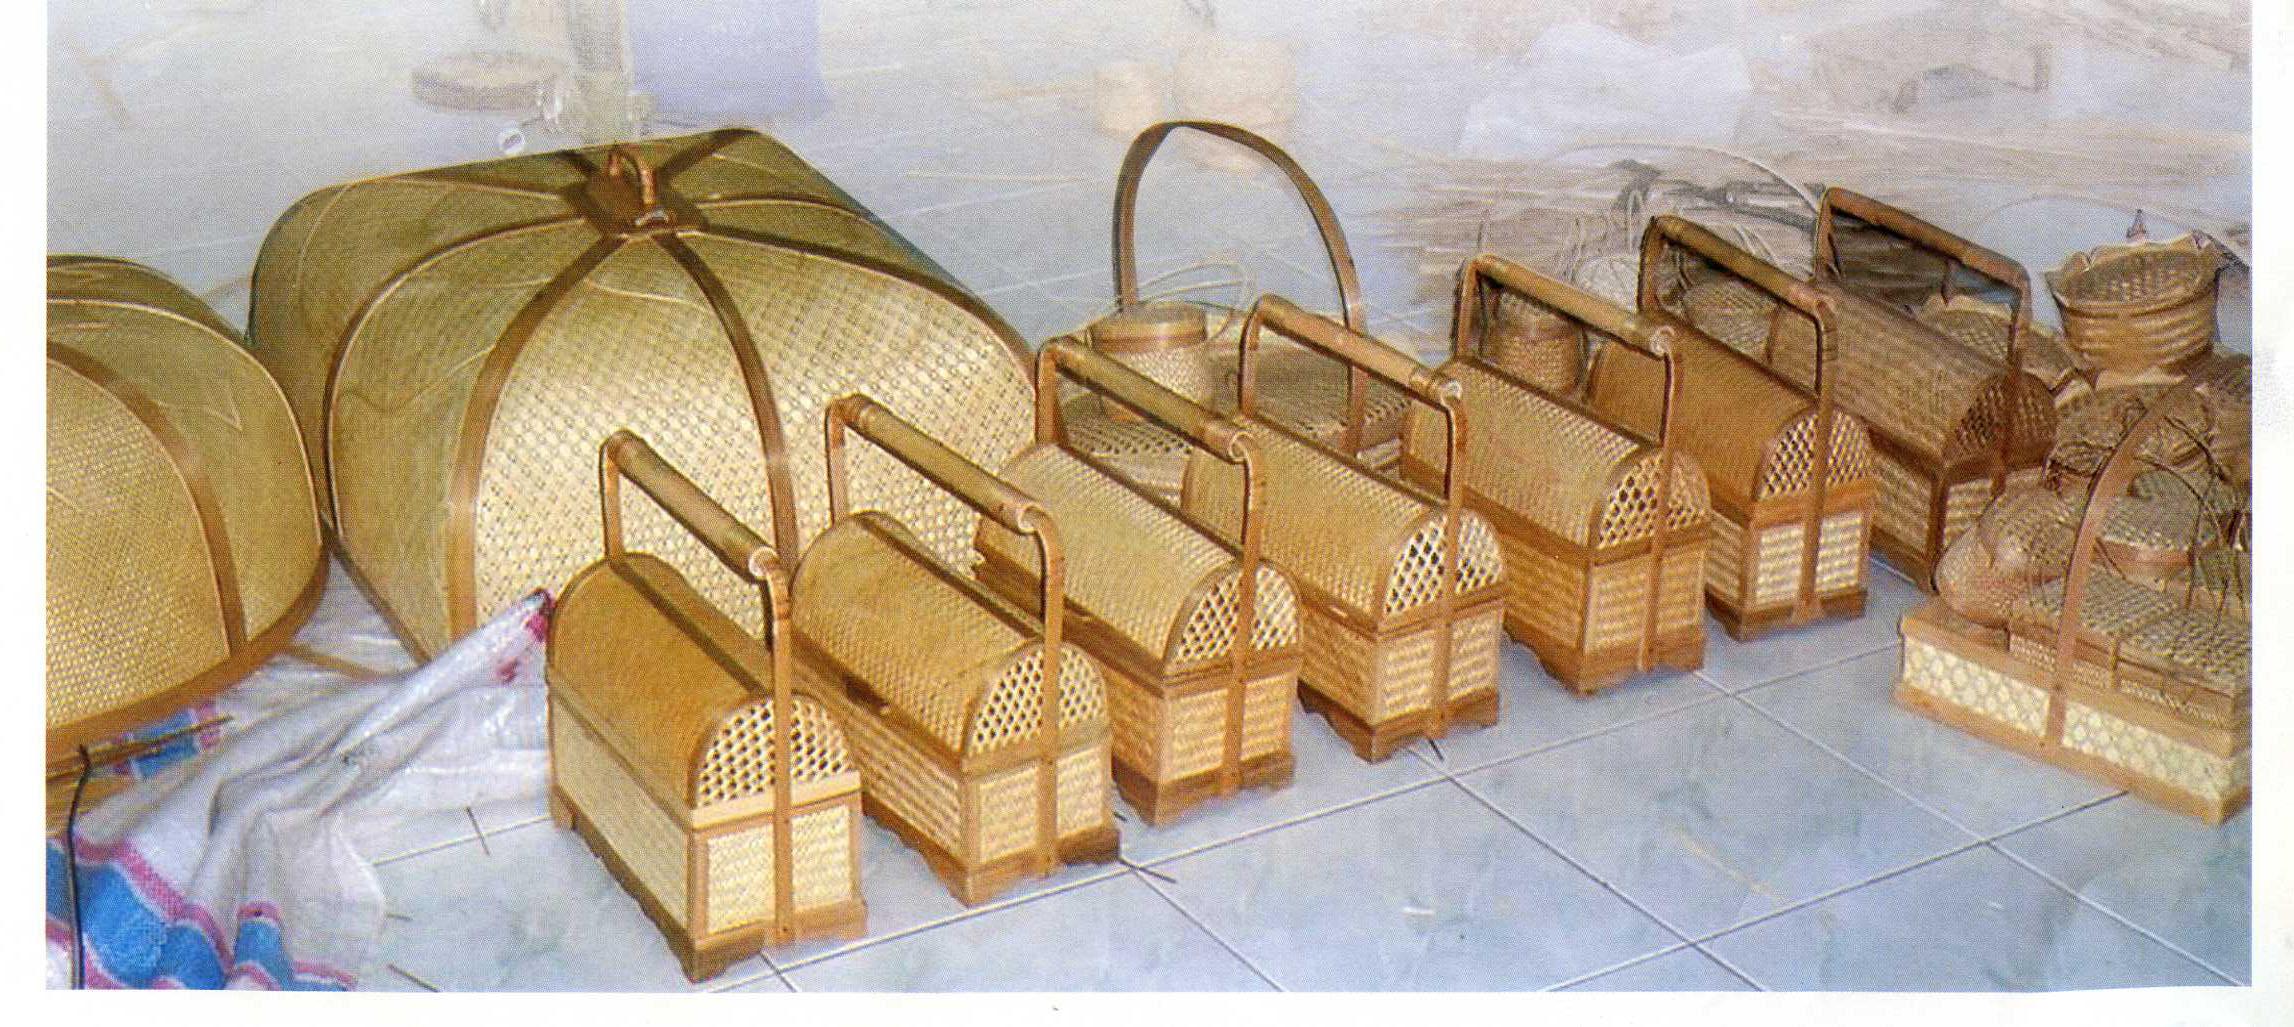 Kerajinan Bambu Trenggalek, Khas Sukatno | Pusaka Jawatimuran2294